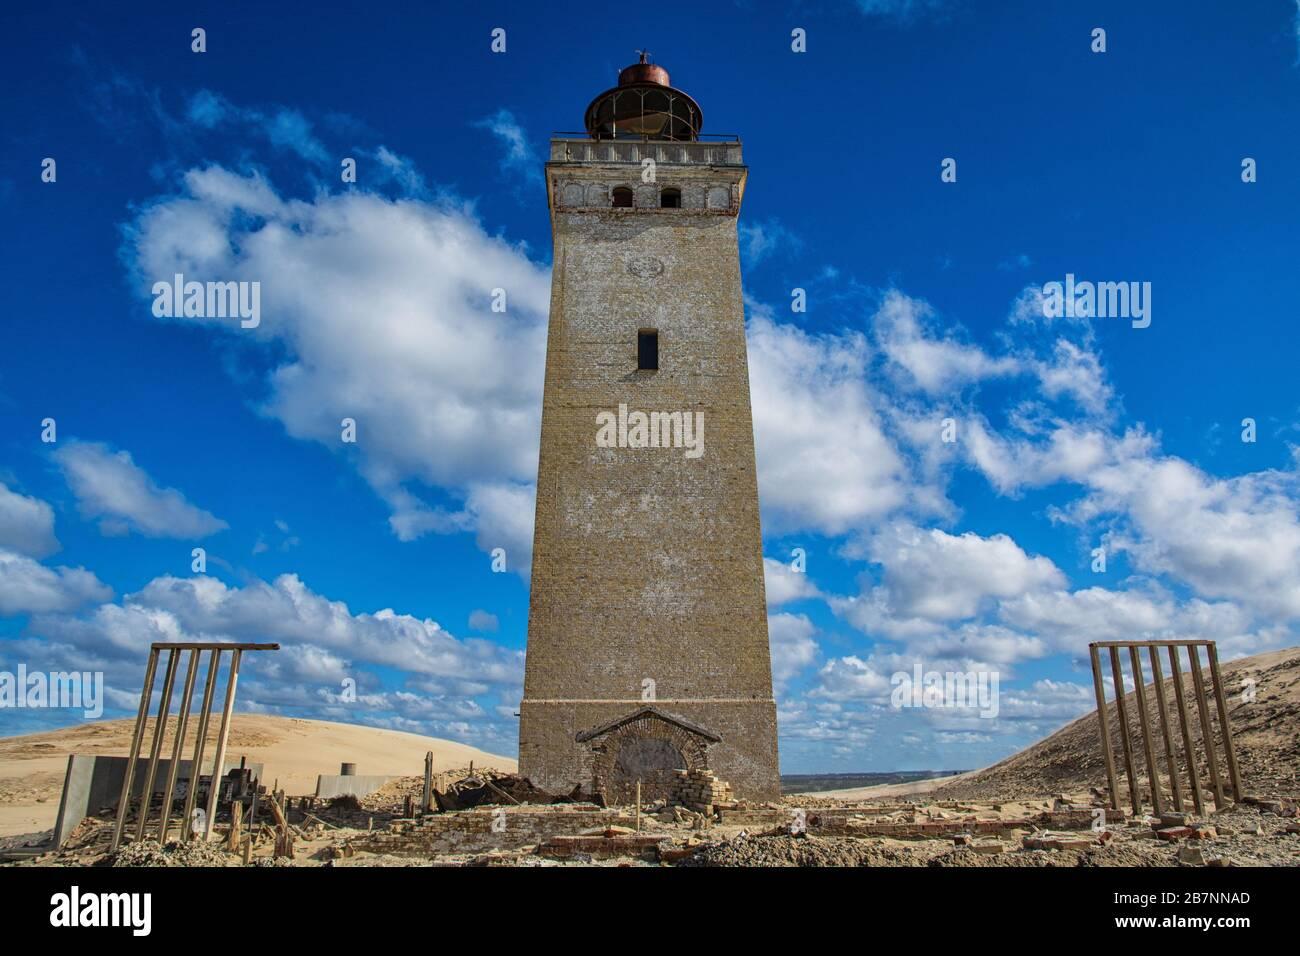 The Rubjerg Knude lighthouse in Denmark Stock Photo